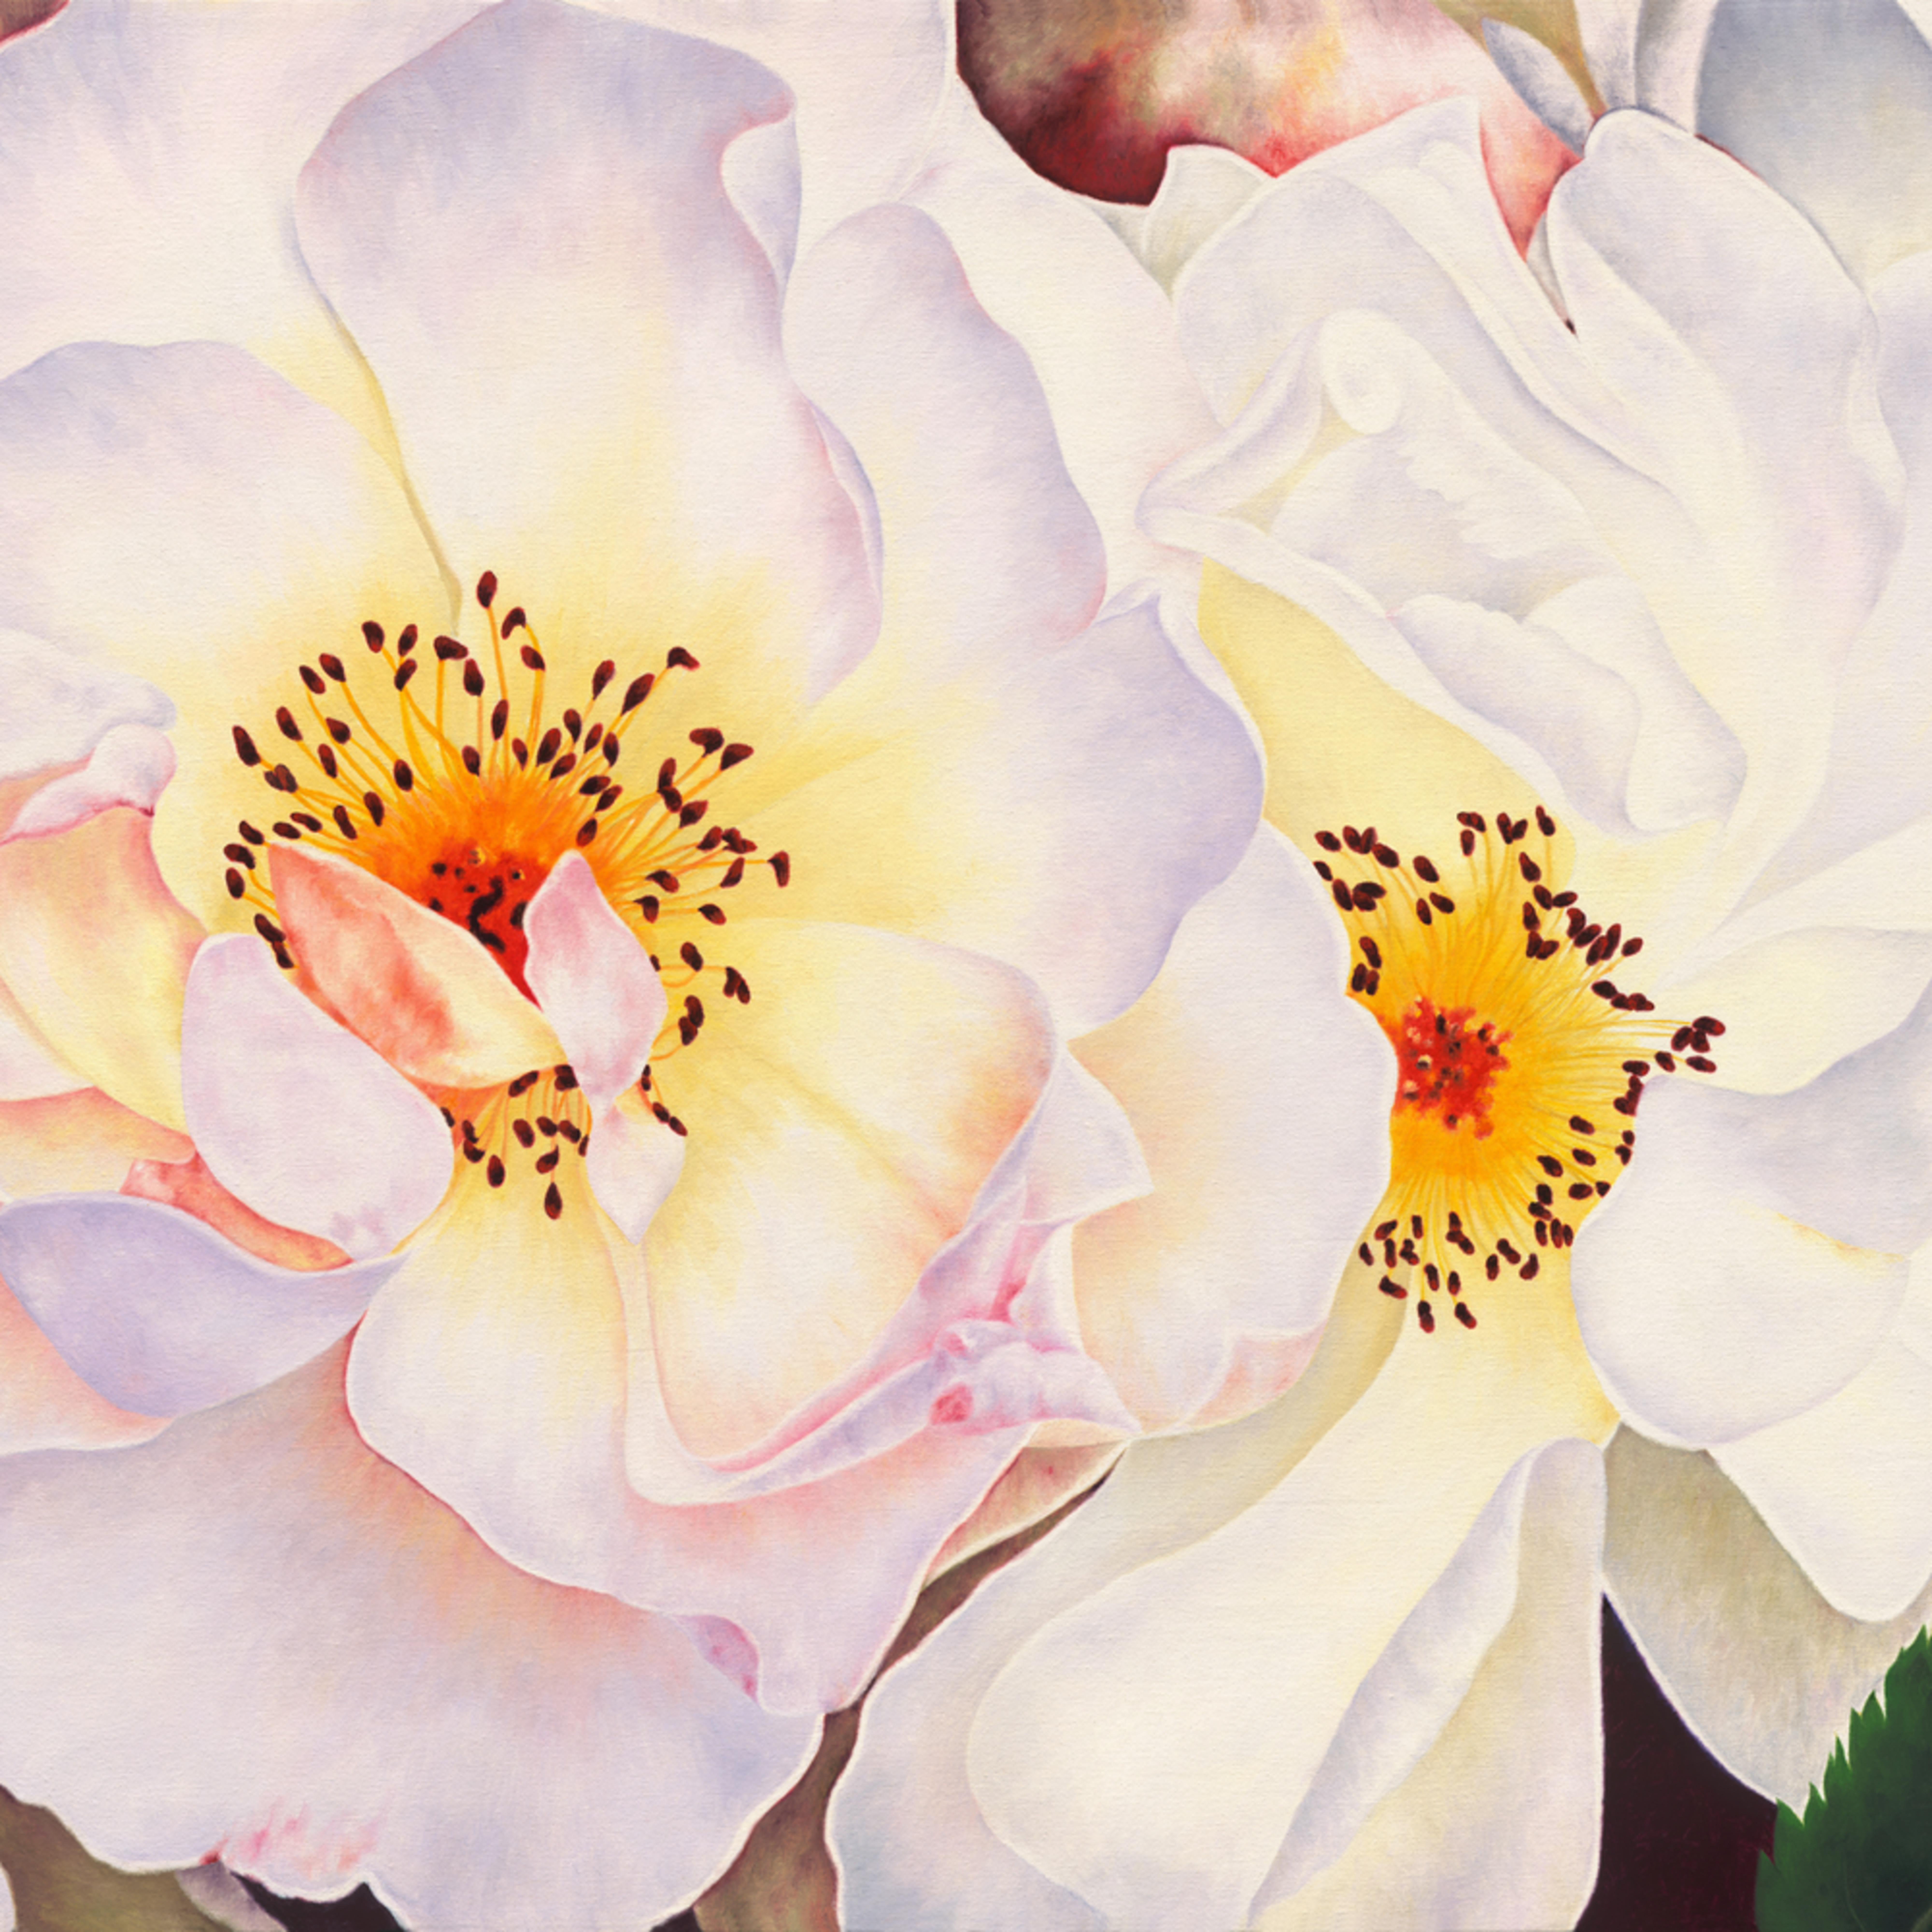 White roses srgb 360 ready copy  makesmaller  ujwoz4